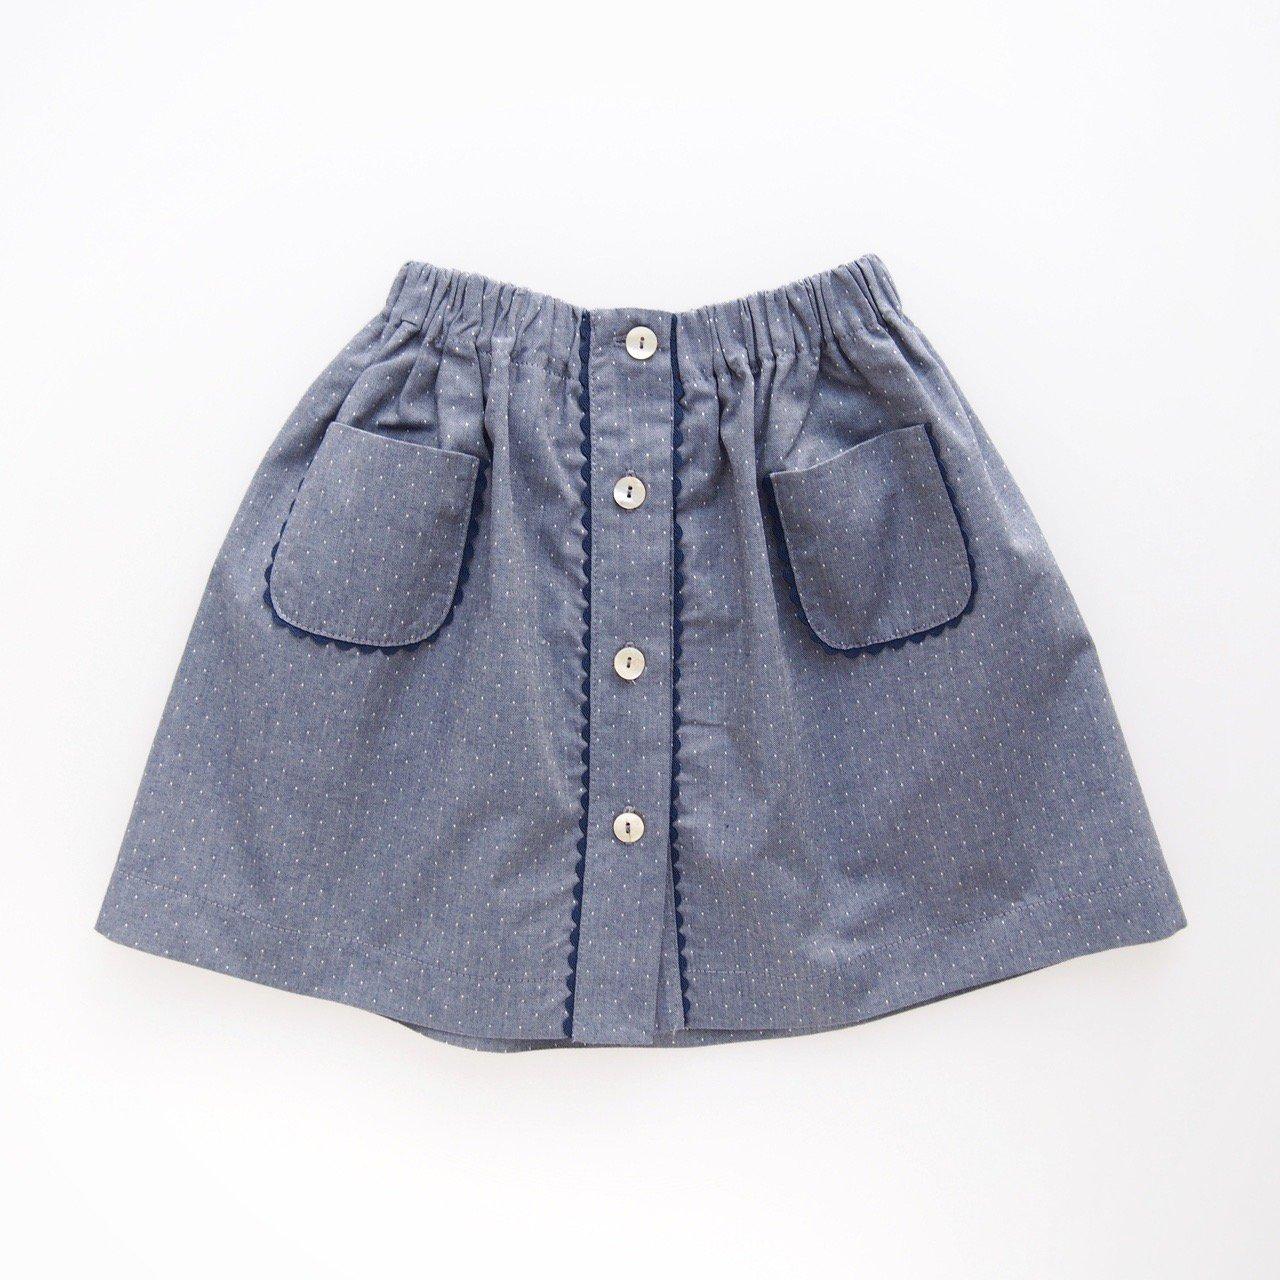 <img class='new_mark_img1' src='https://img.shop-pro.jp/img/new/icons14.gif' style='border:none;display:inline;margin:0px;padding:0px;width:auto;' />Amaia Kids - Juliette skirt (Dots denim)